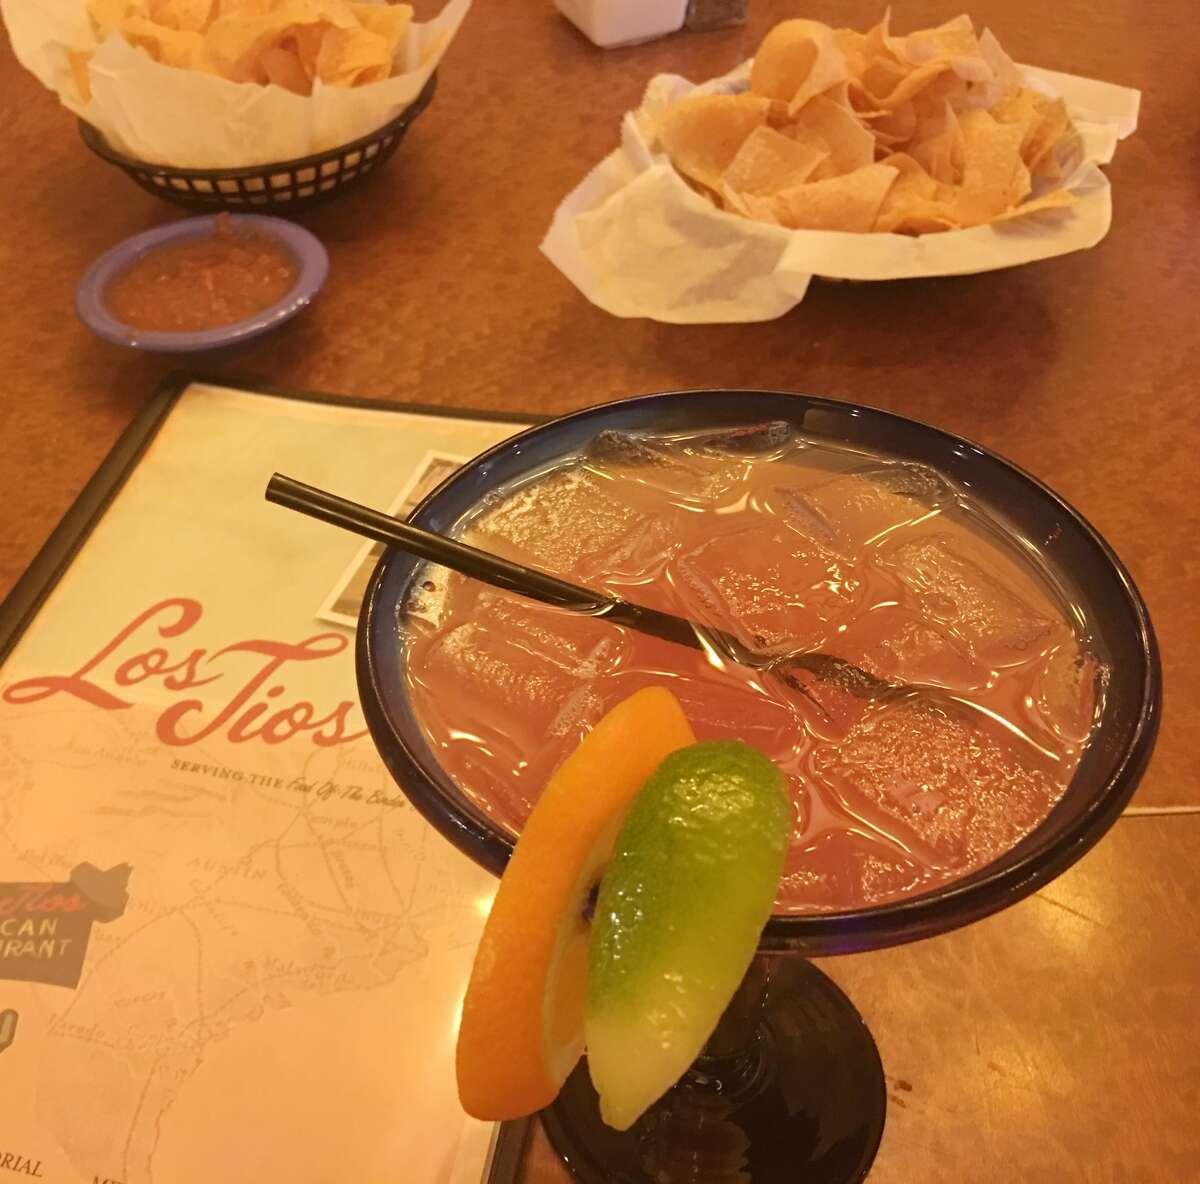 The blood-orange margarita at Los Tios. (Melissa Aguilar photo)